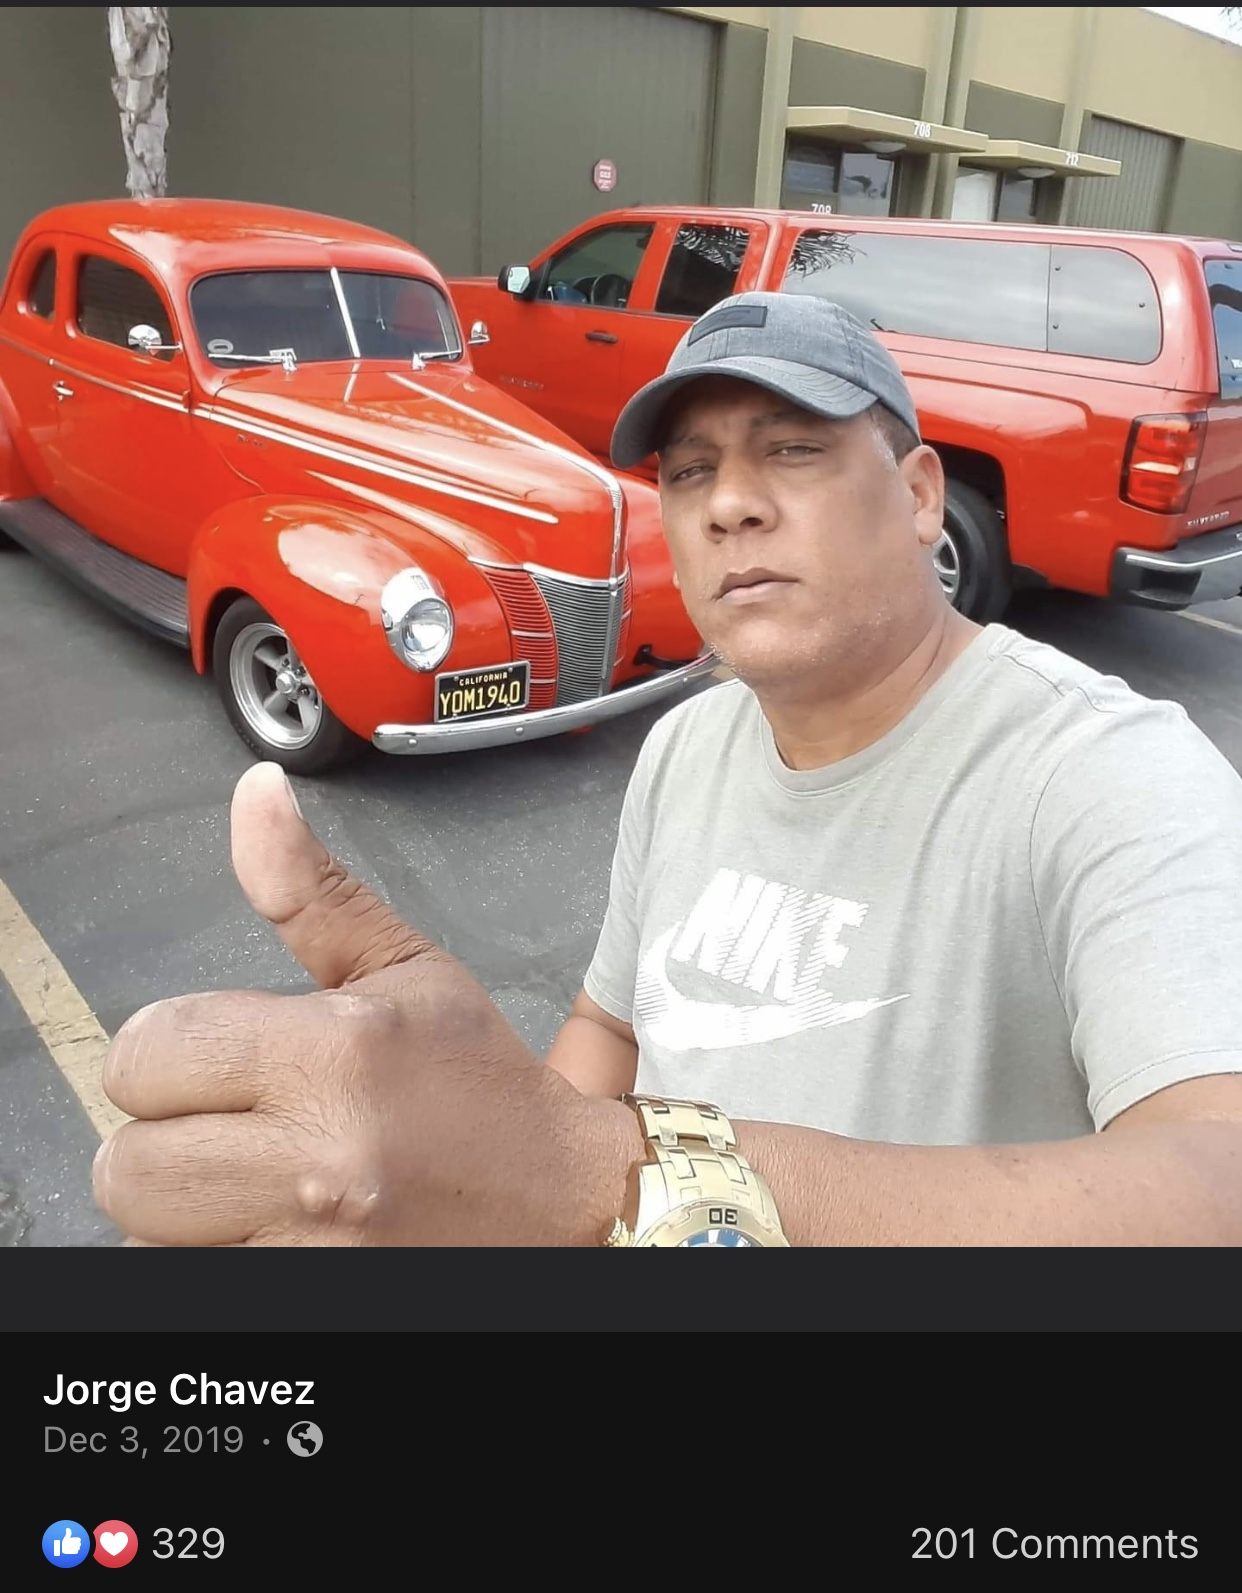 Jorge Lázaro Chavez